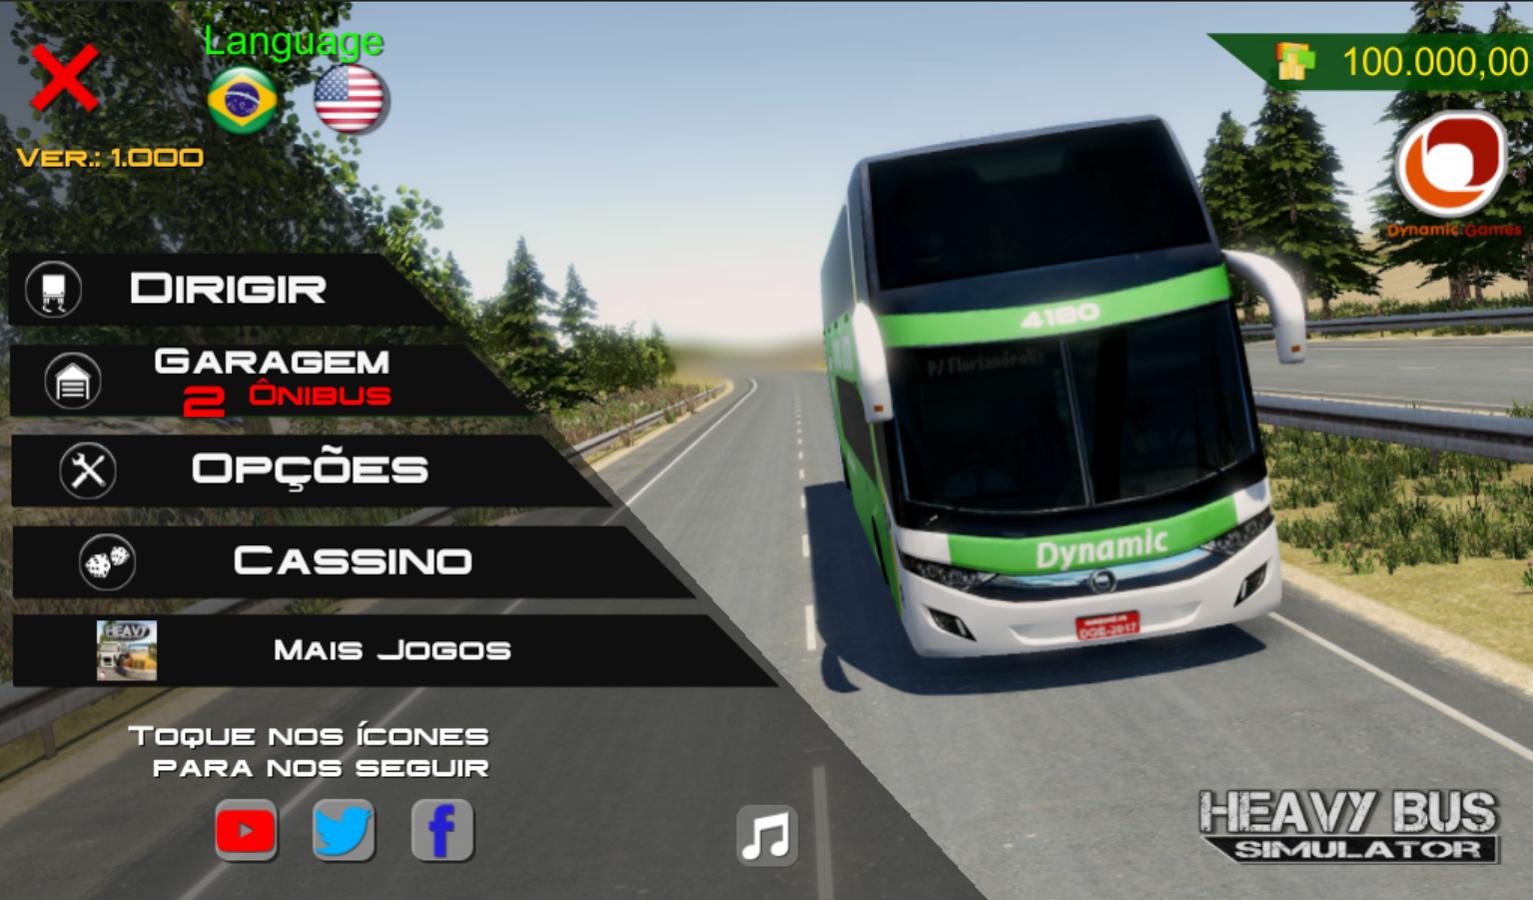 Heavy Bus Simulator MOD APK terbaru